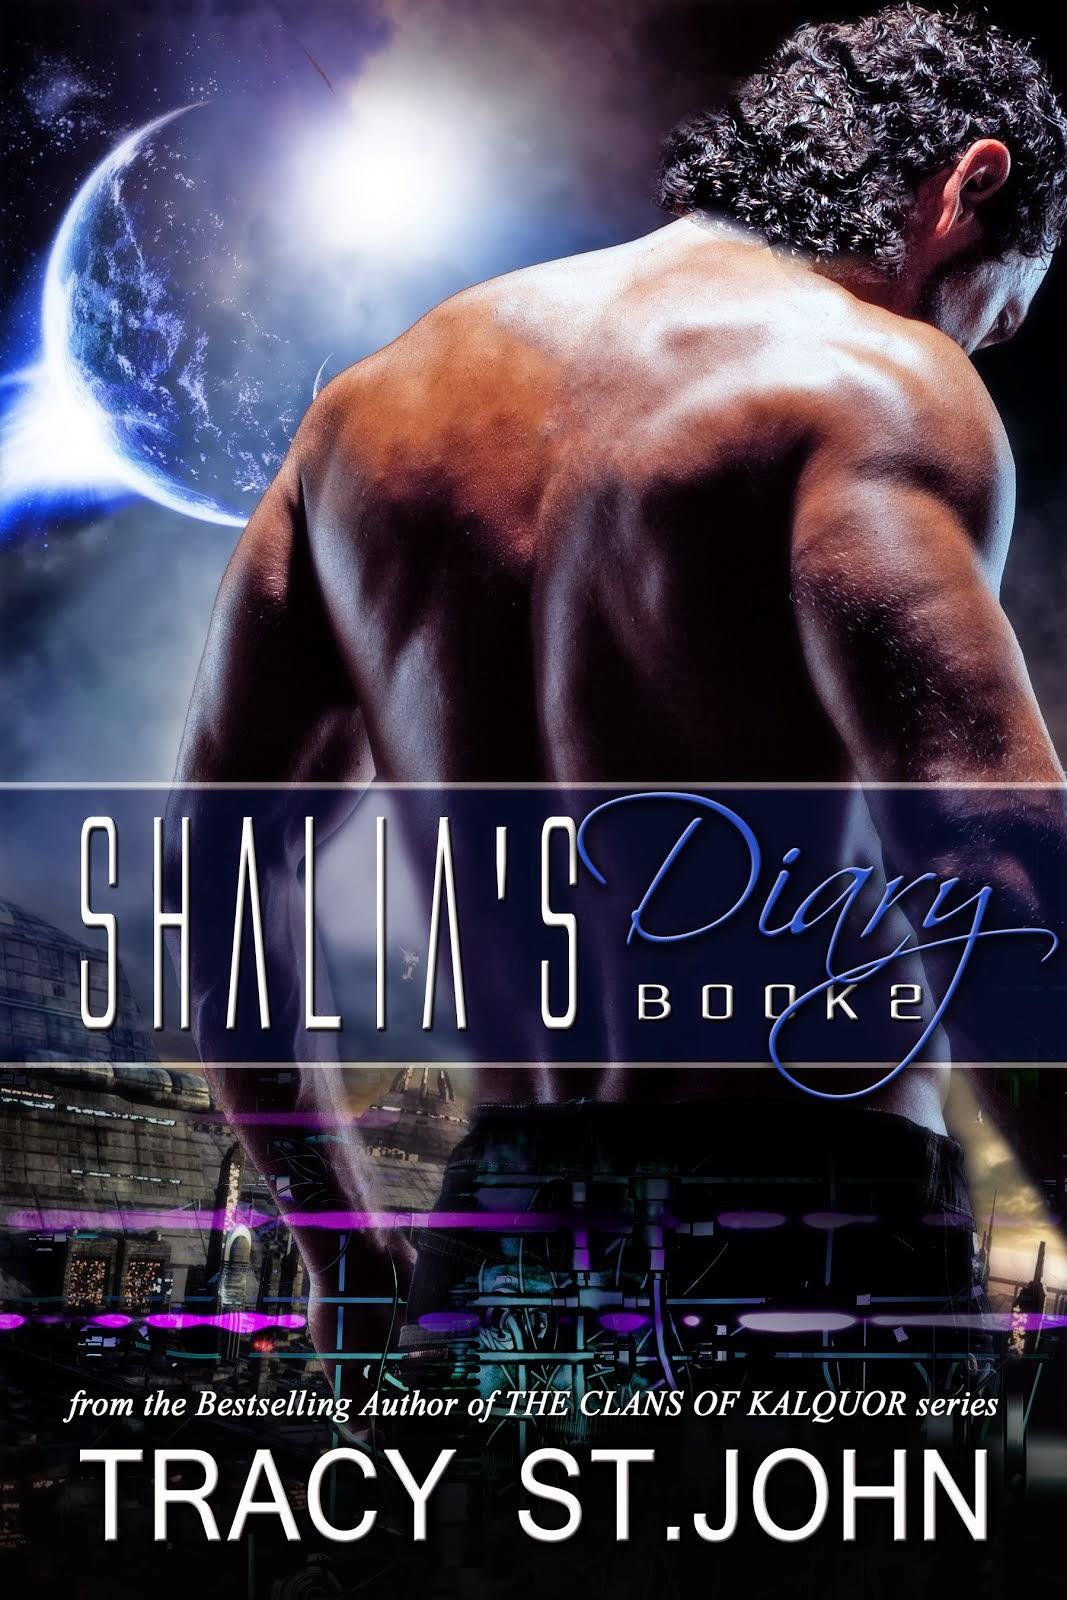 Shalia's Diary Book 2